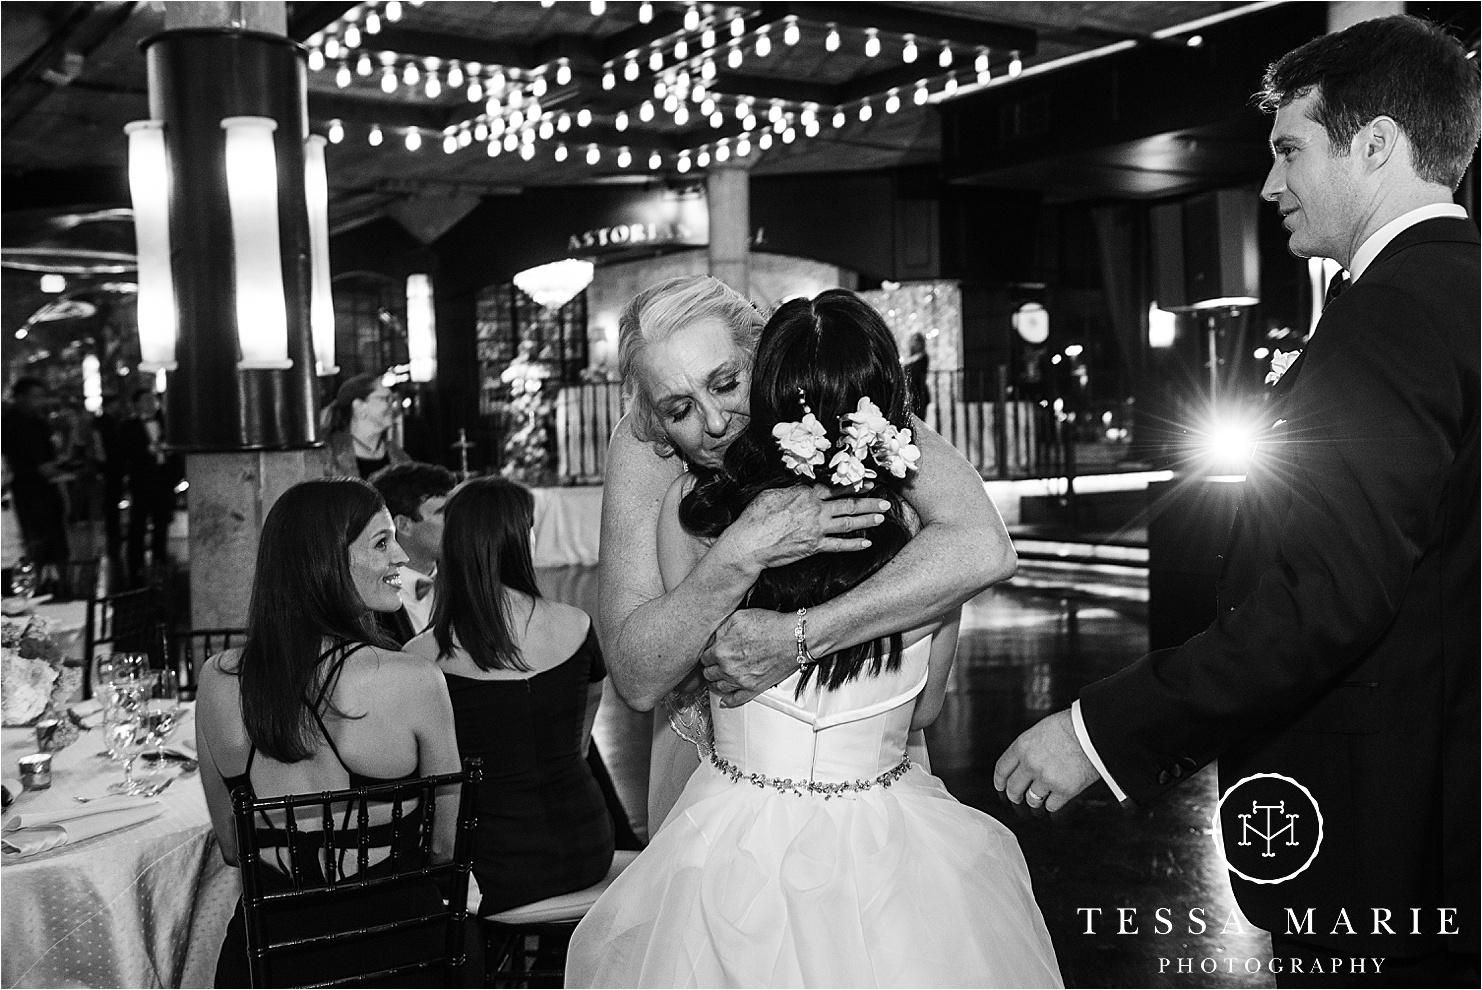 Tessa_marie_weddings_houston_wedding_photographer_The_astorian_0173.jpg